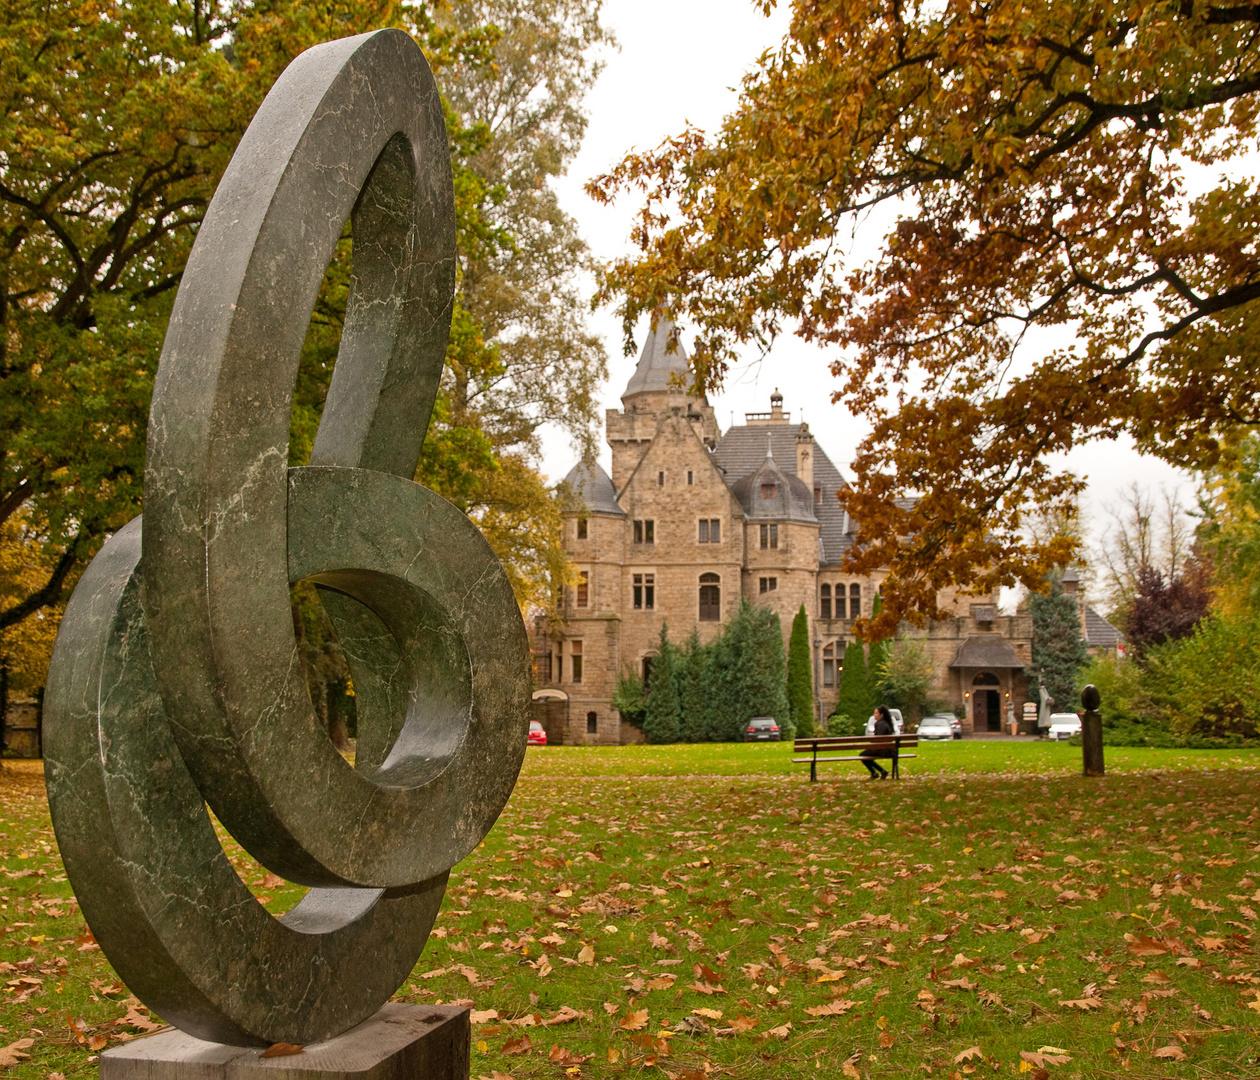 Schloss Garvensburg, Kunst-Ausstellung SHONA-ART